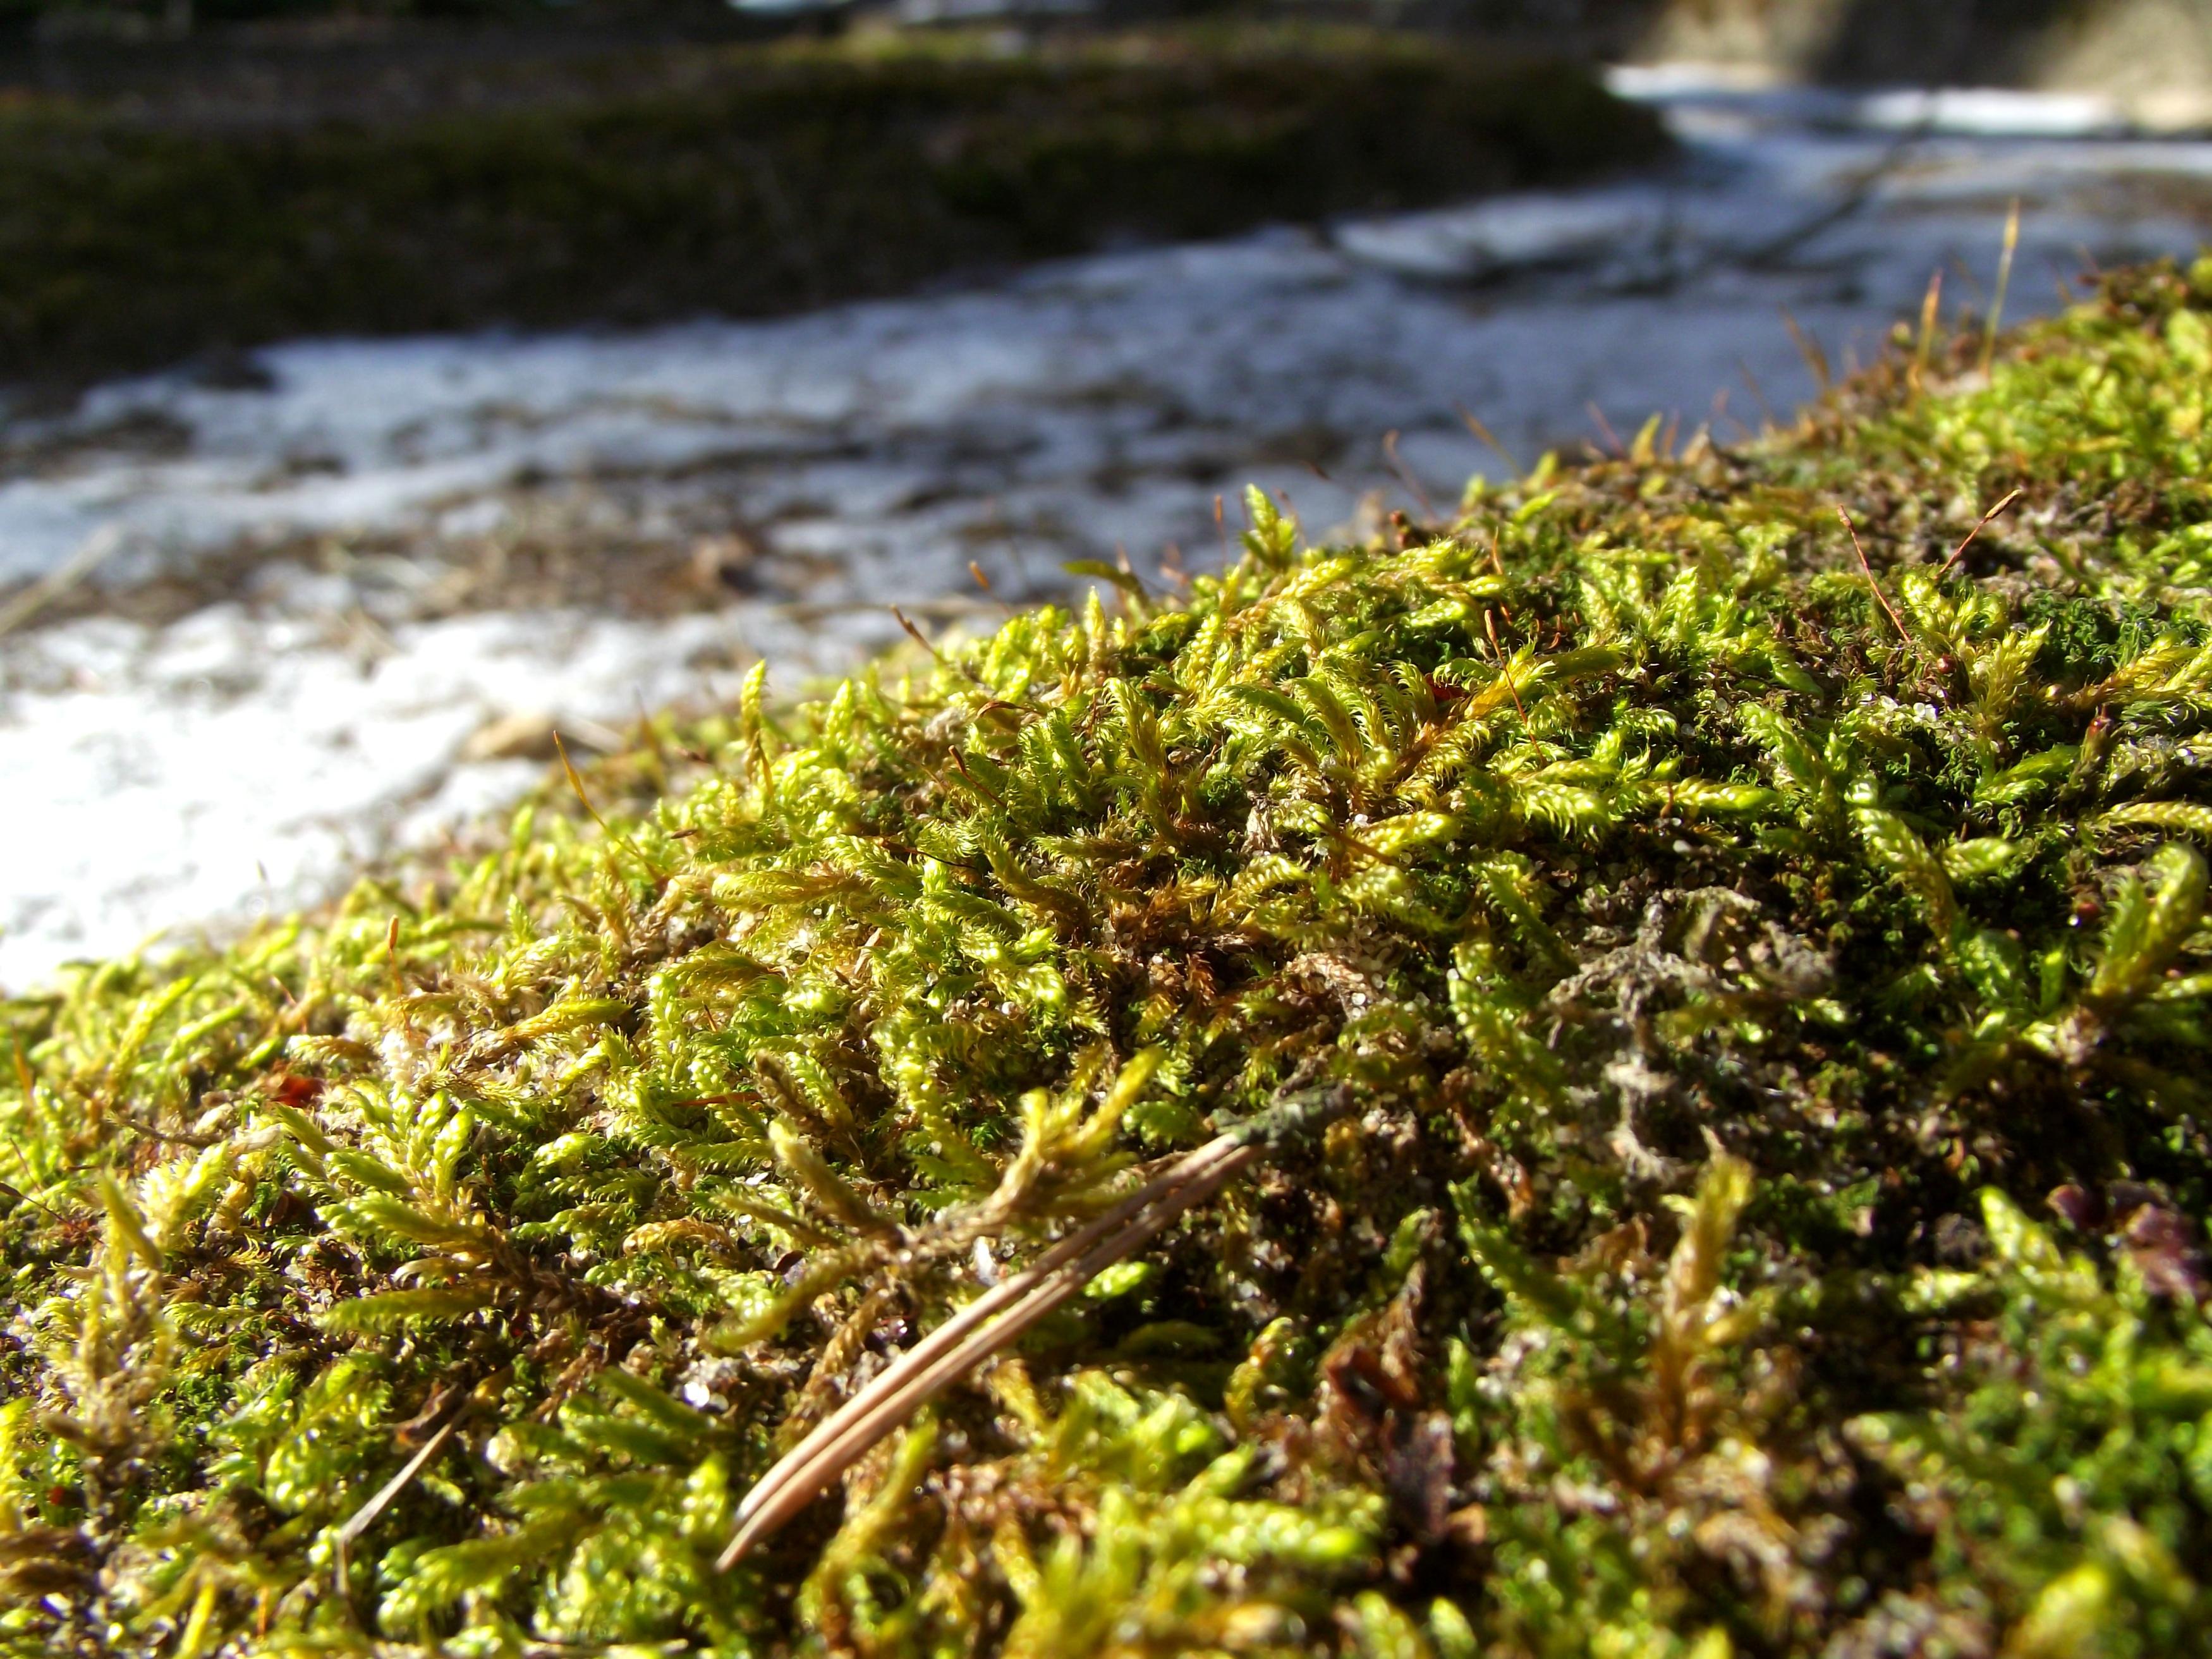 Moss, Graveyard, Moisture, Nature, Sad, HQ Photo